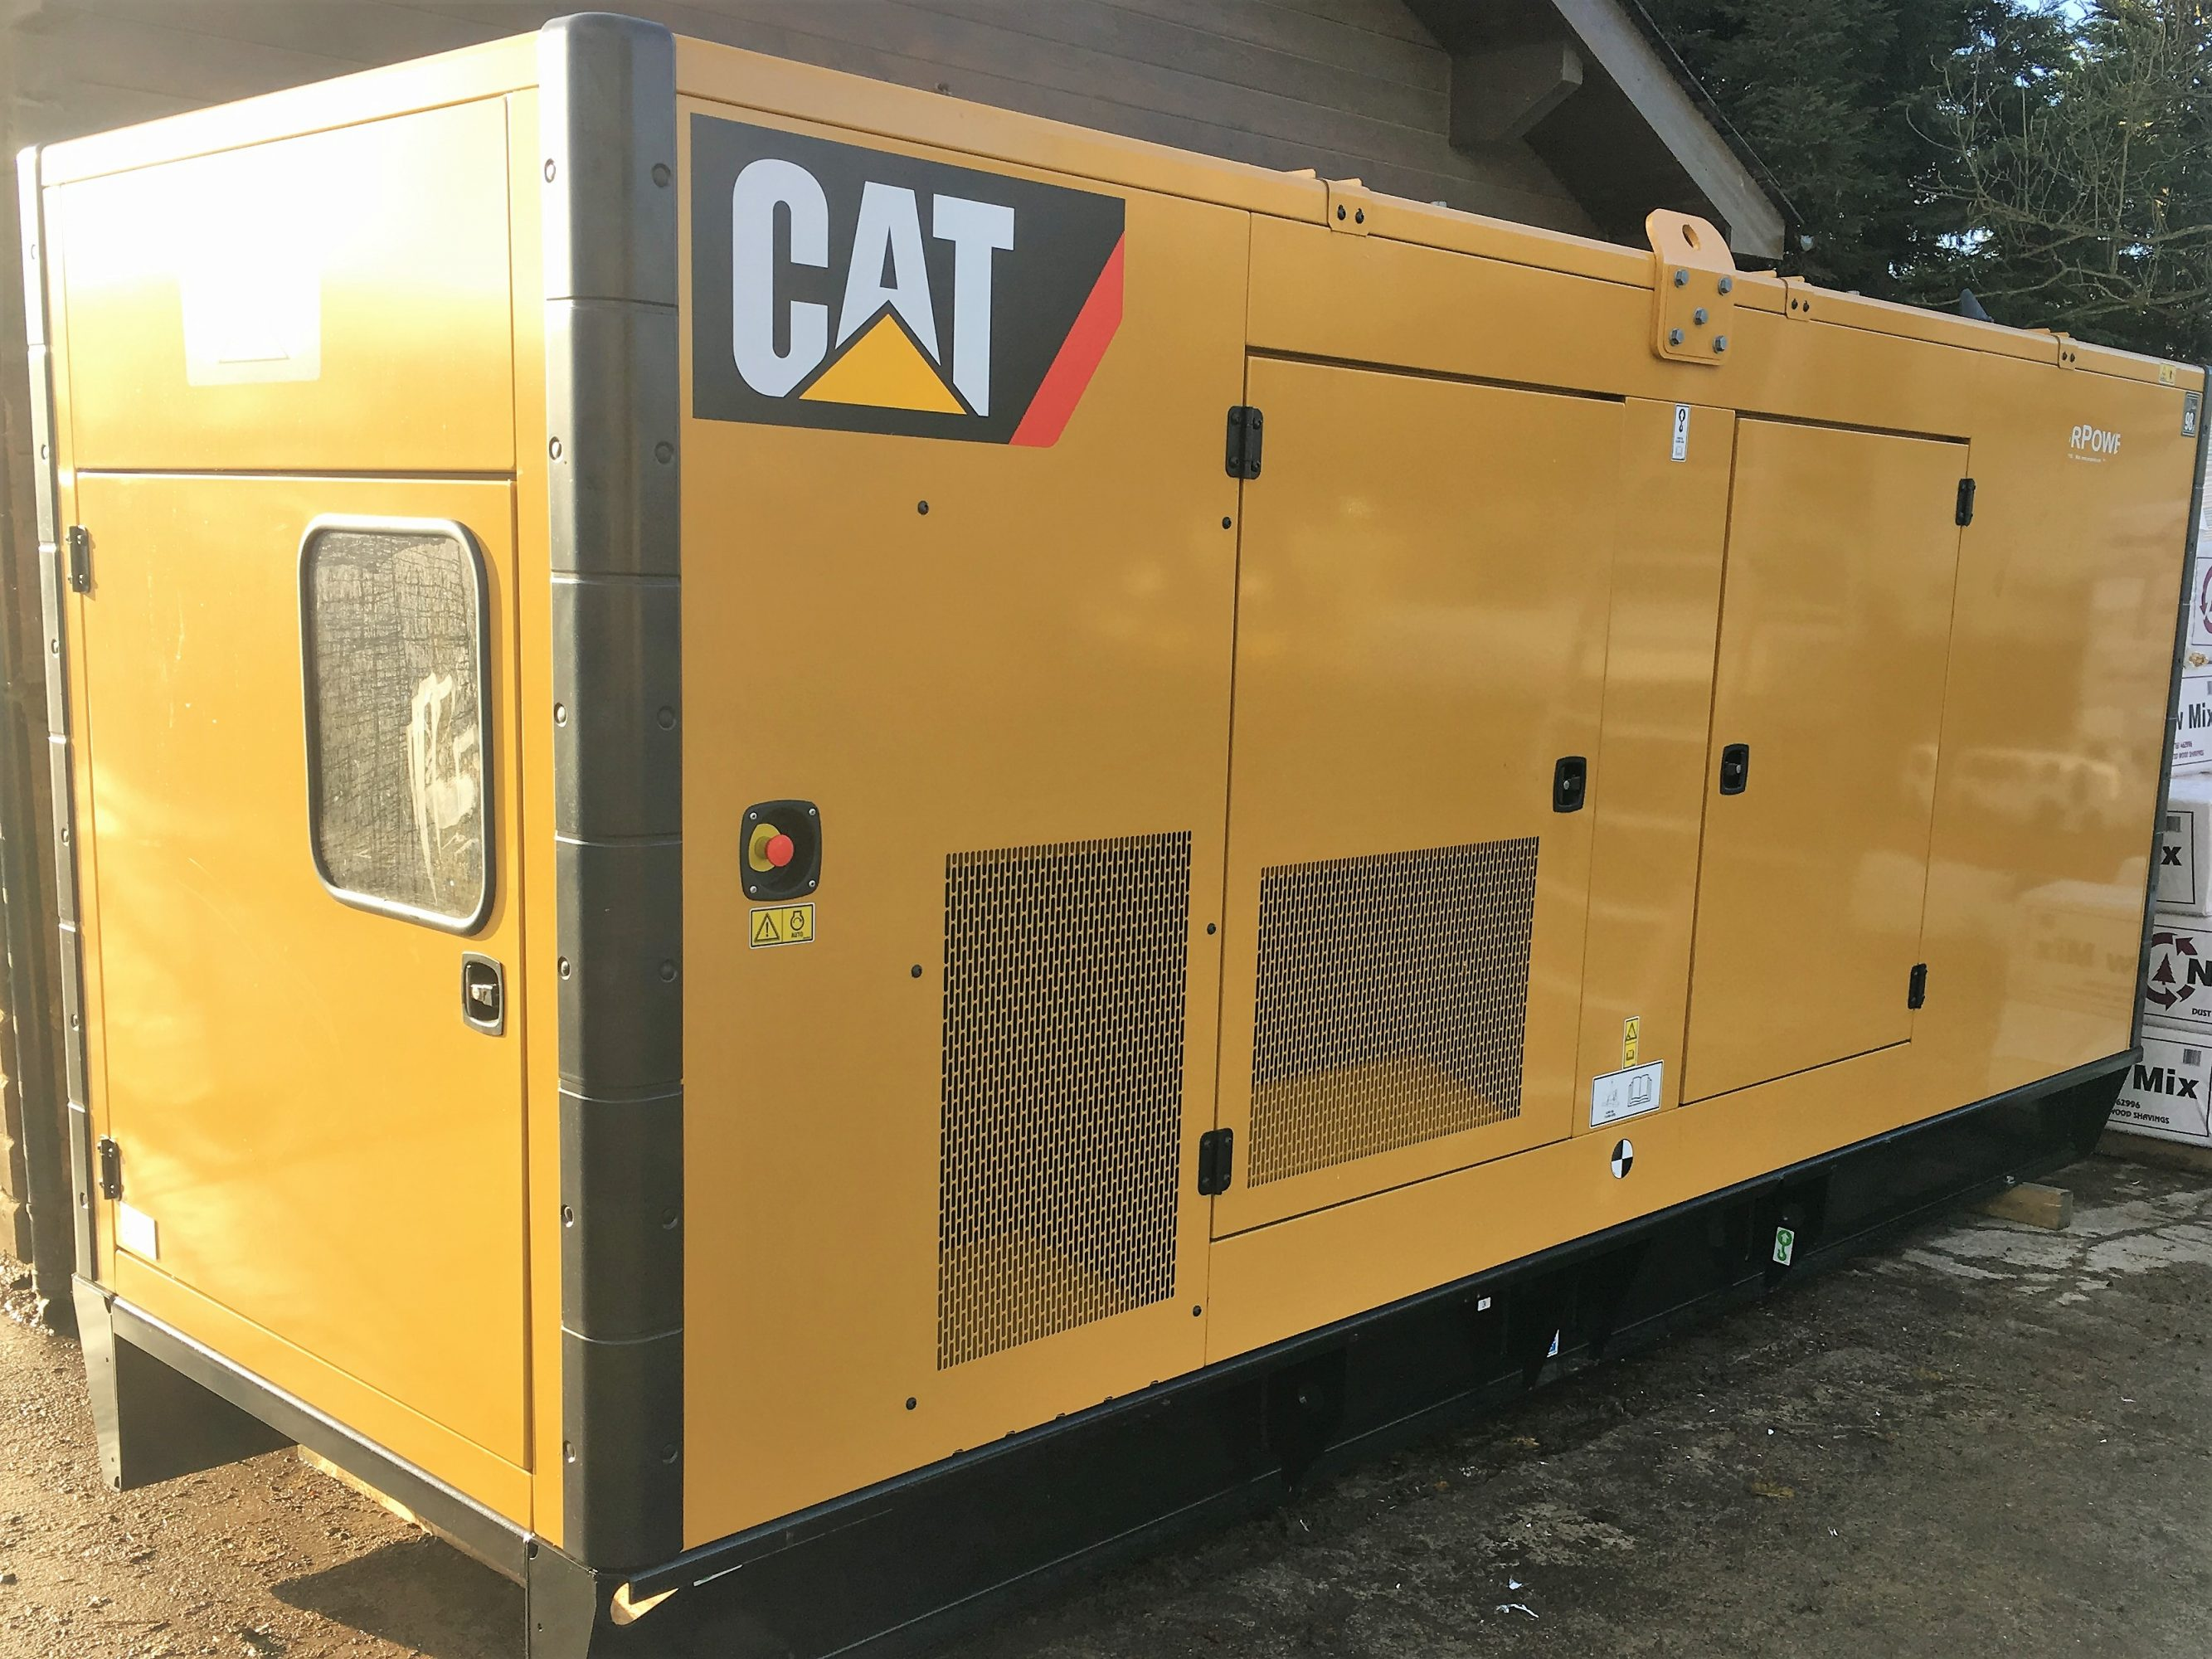 Cat 715 Kva C18 Diesel Generator For Sale Uk And Export Sales Bestdieselgeneratorcom